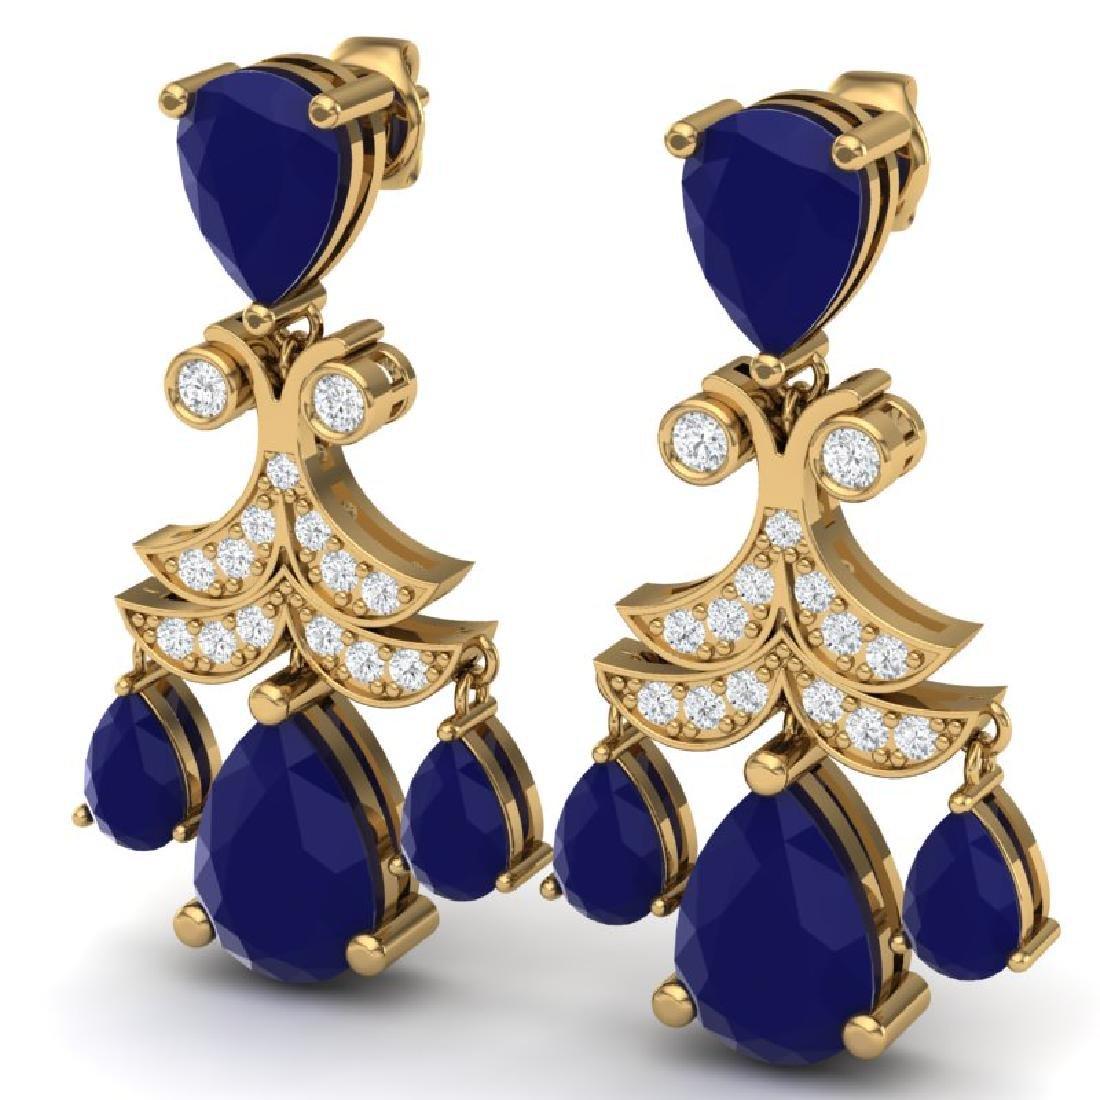 11.97 CTW Royalty Sapphire & VS Diamond Earrings 18K - 2